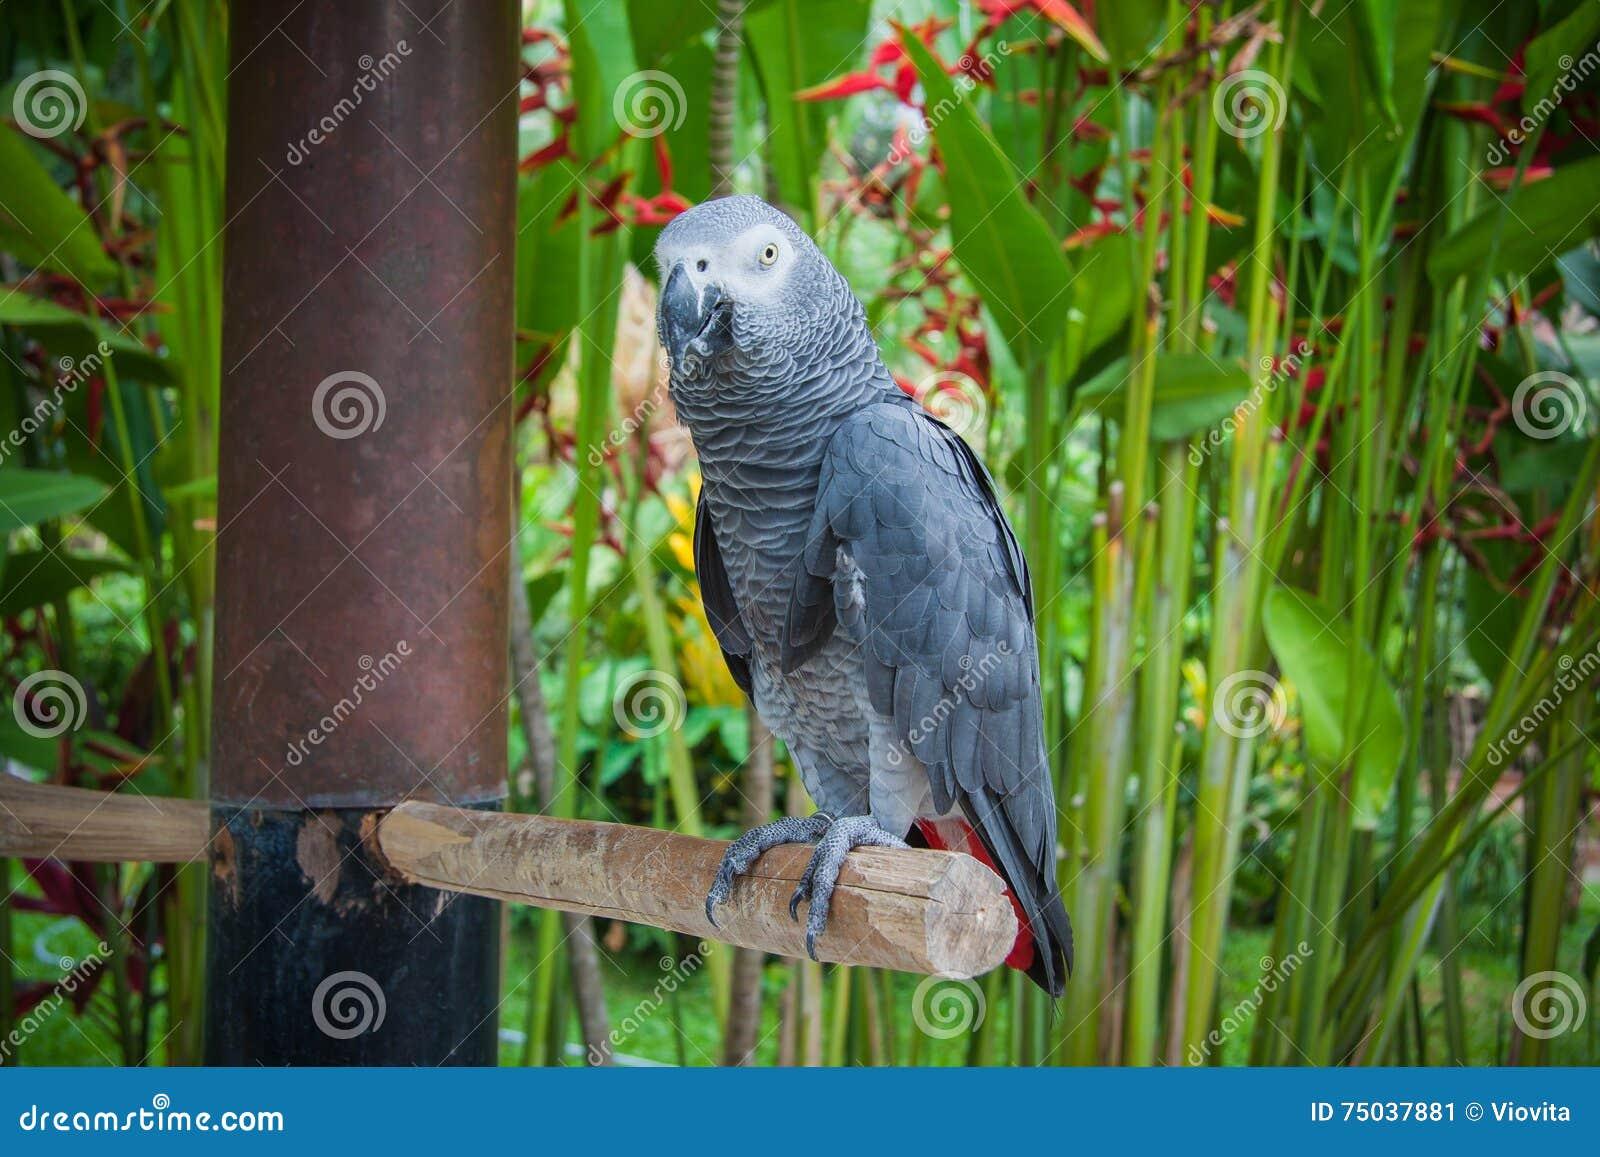 Grey Parrot Wildlife In Bali Birds And Reptiles Park Stock Image